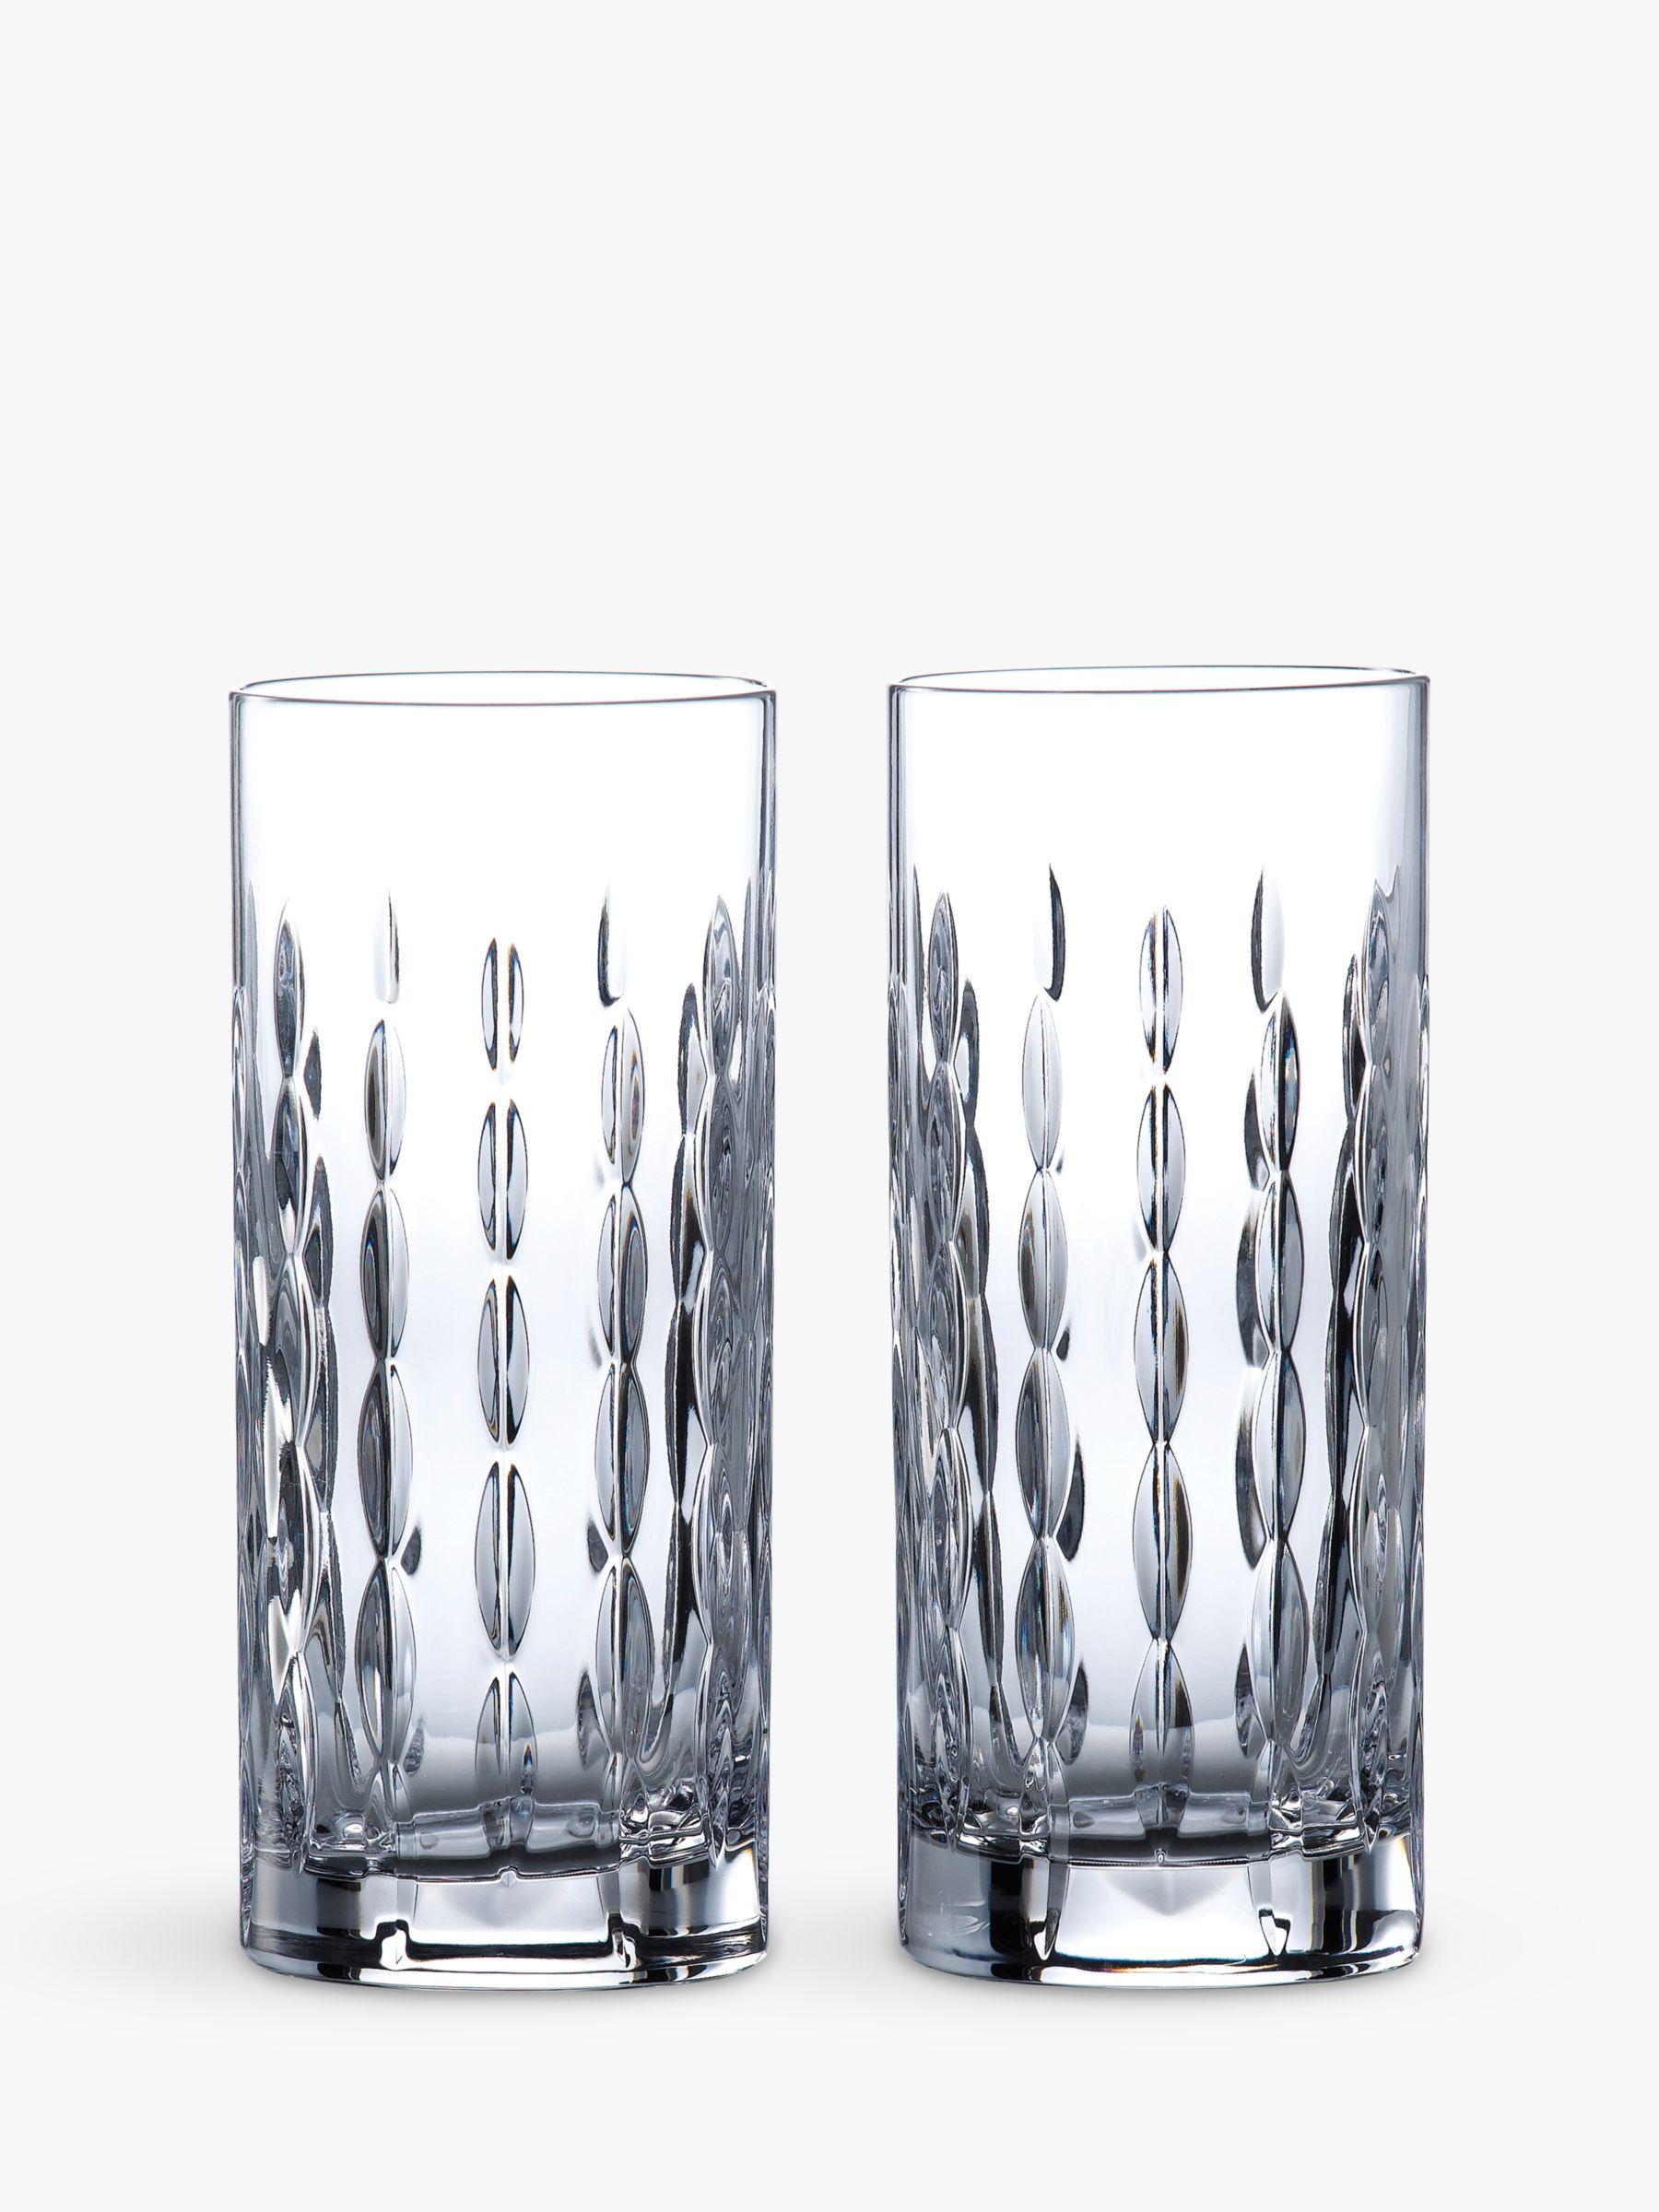 Royal Doulton Royal Doulton R&D Collection Neptune Crystal Cut Glass Highballs, 320ml, Set of 2